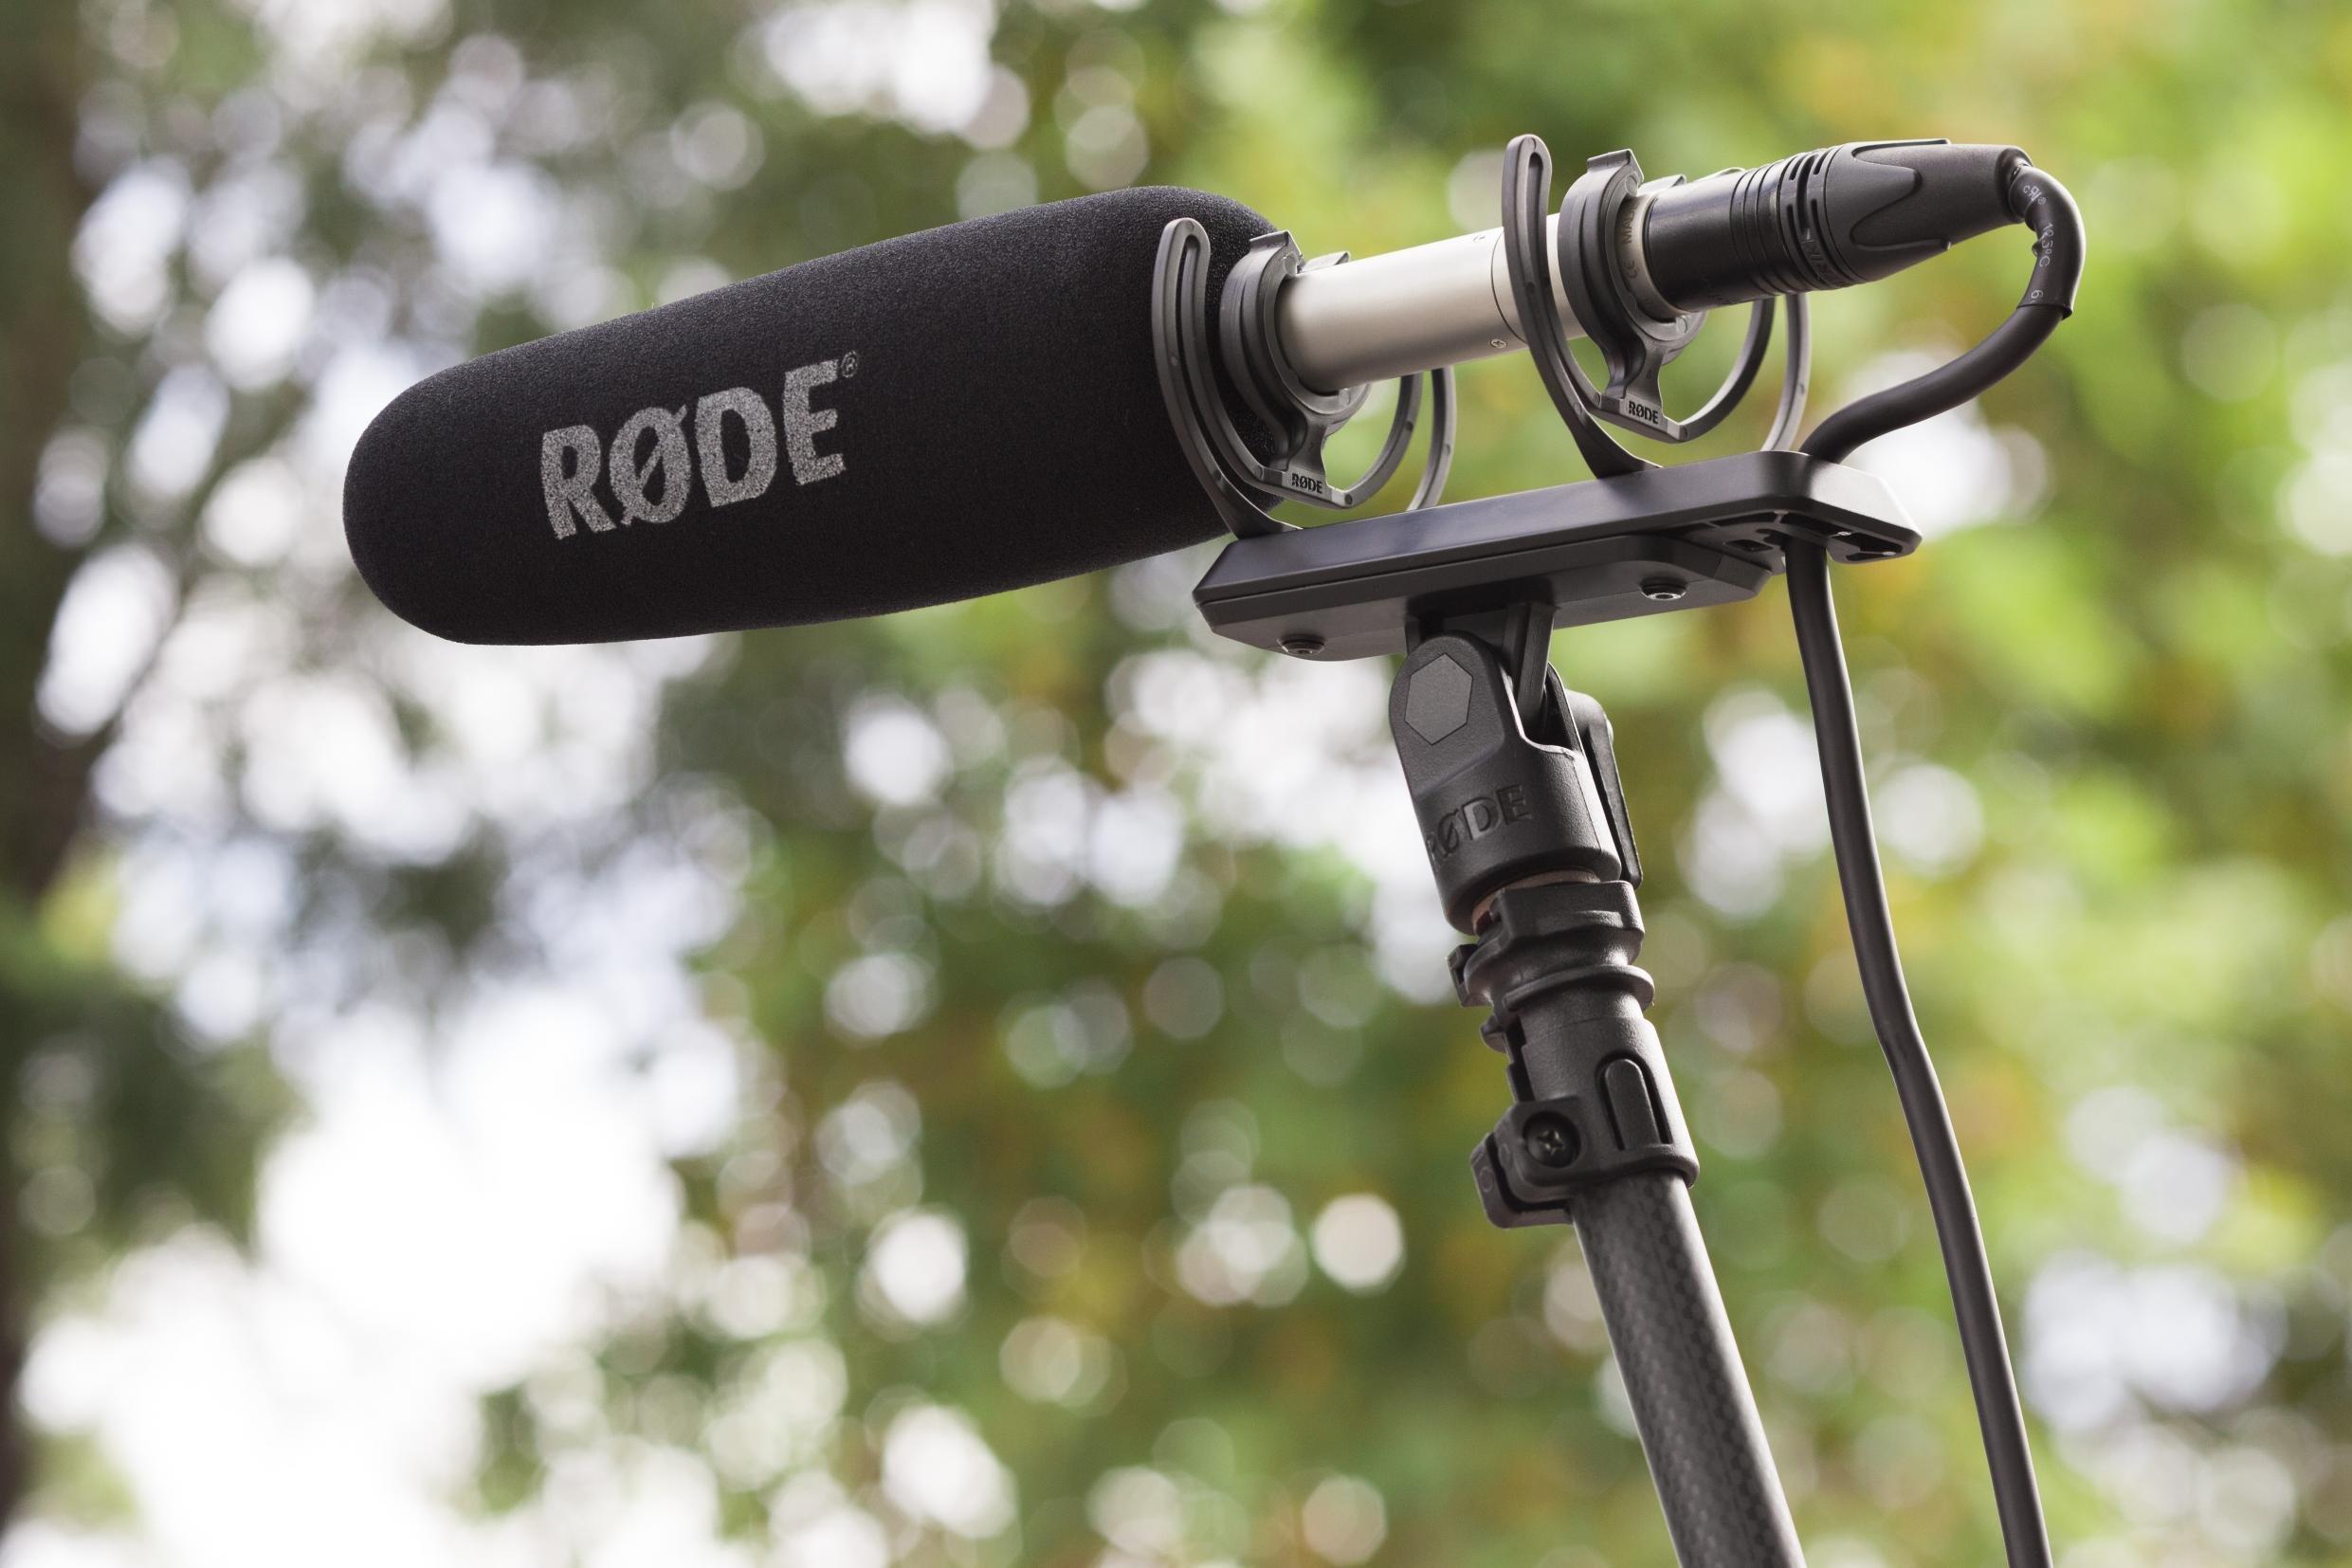 Rode SM4-R Suspension Shock Mount for 3/8'' or 5/8'' Thread Mounts